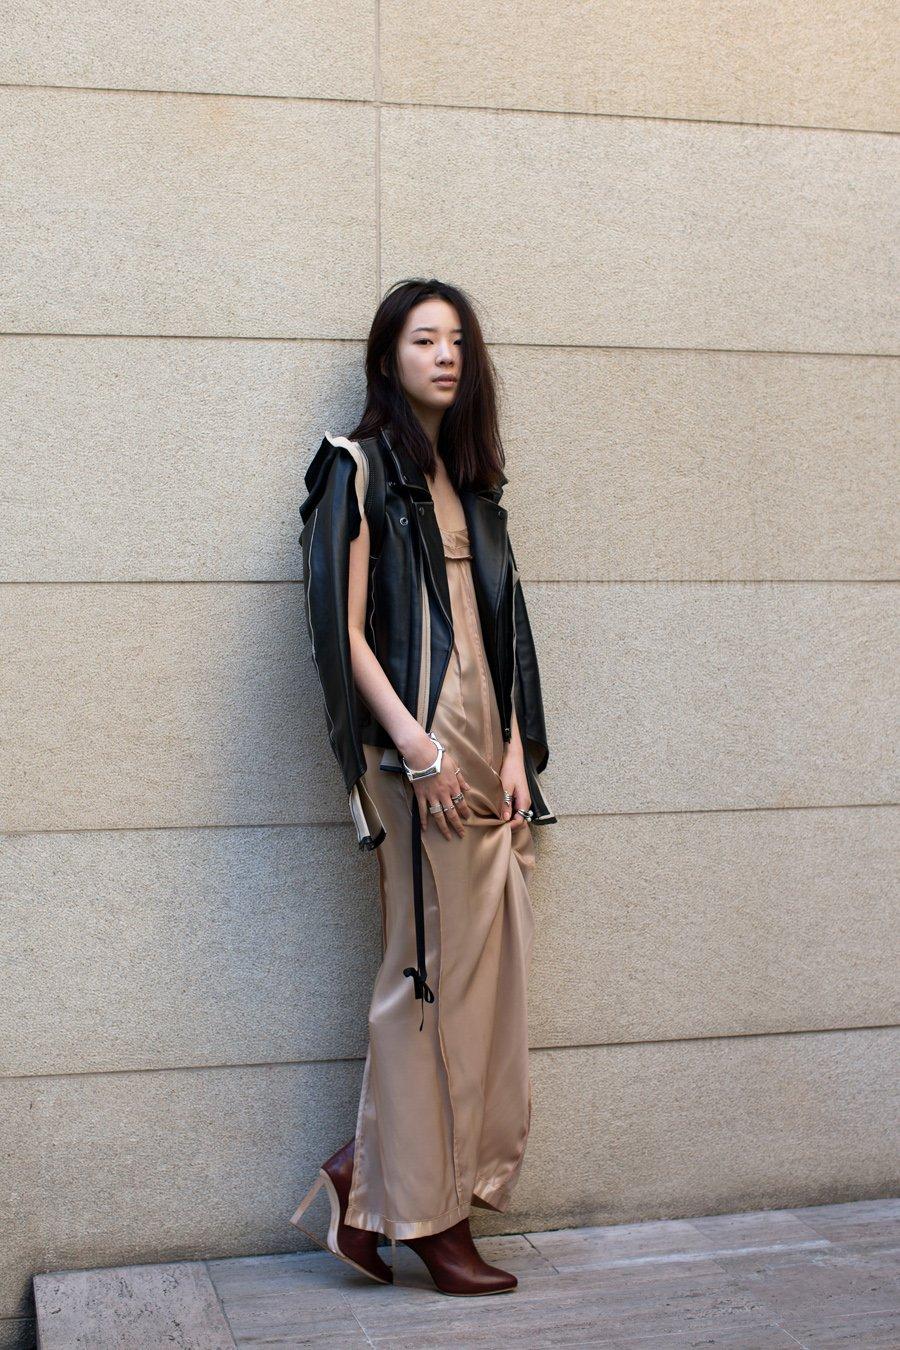 Платье, куртка Maison Martin Margiela for H&M